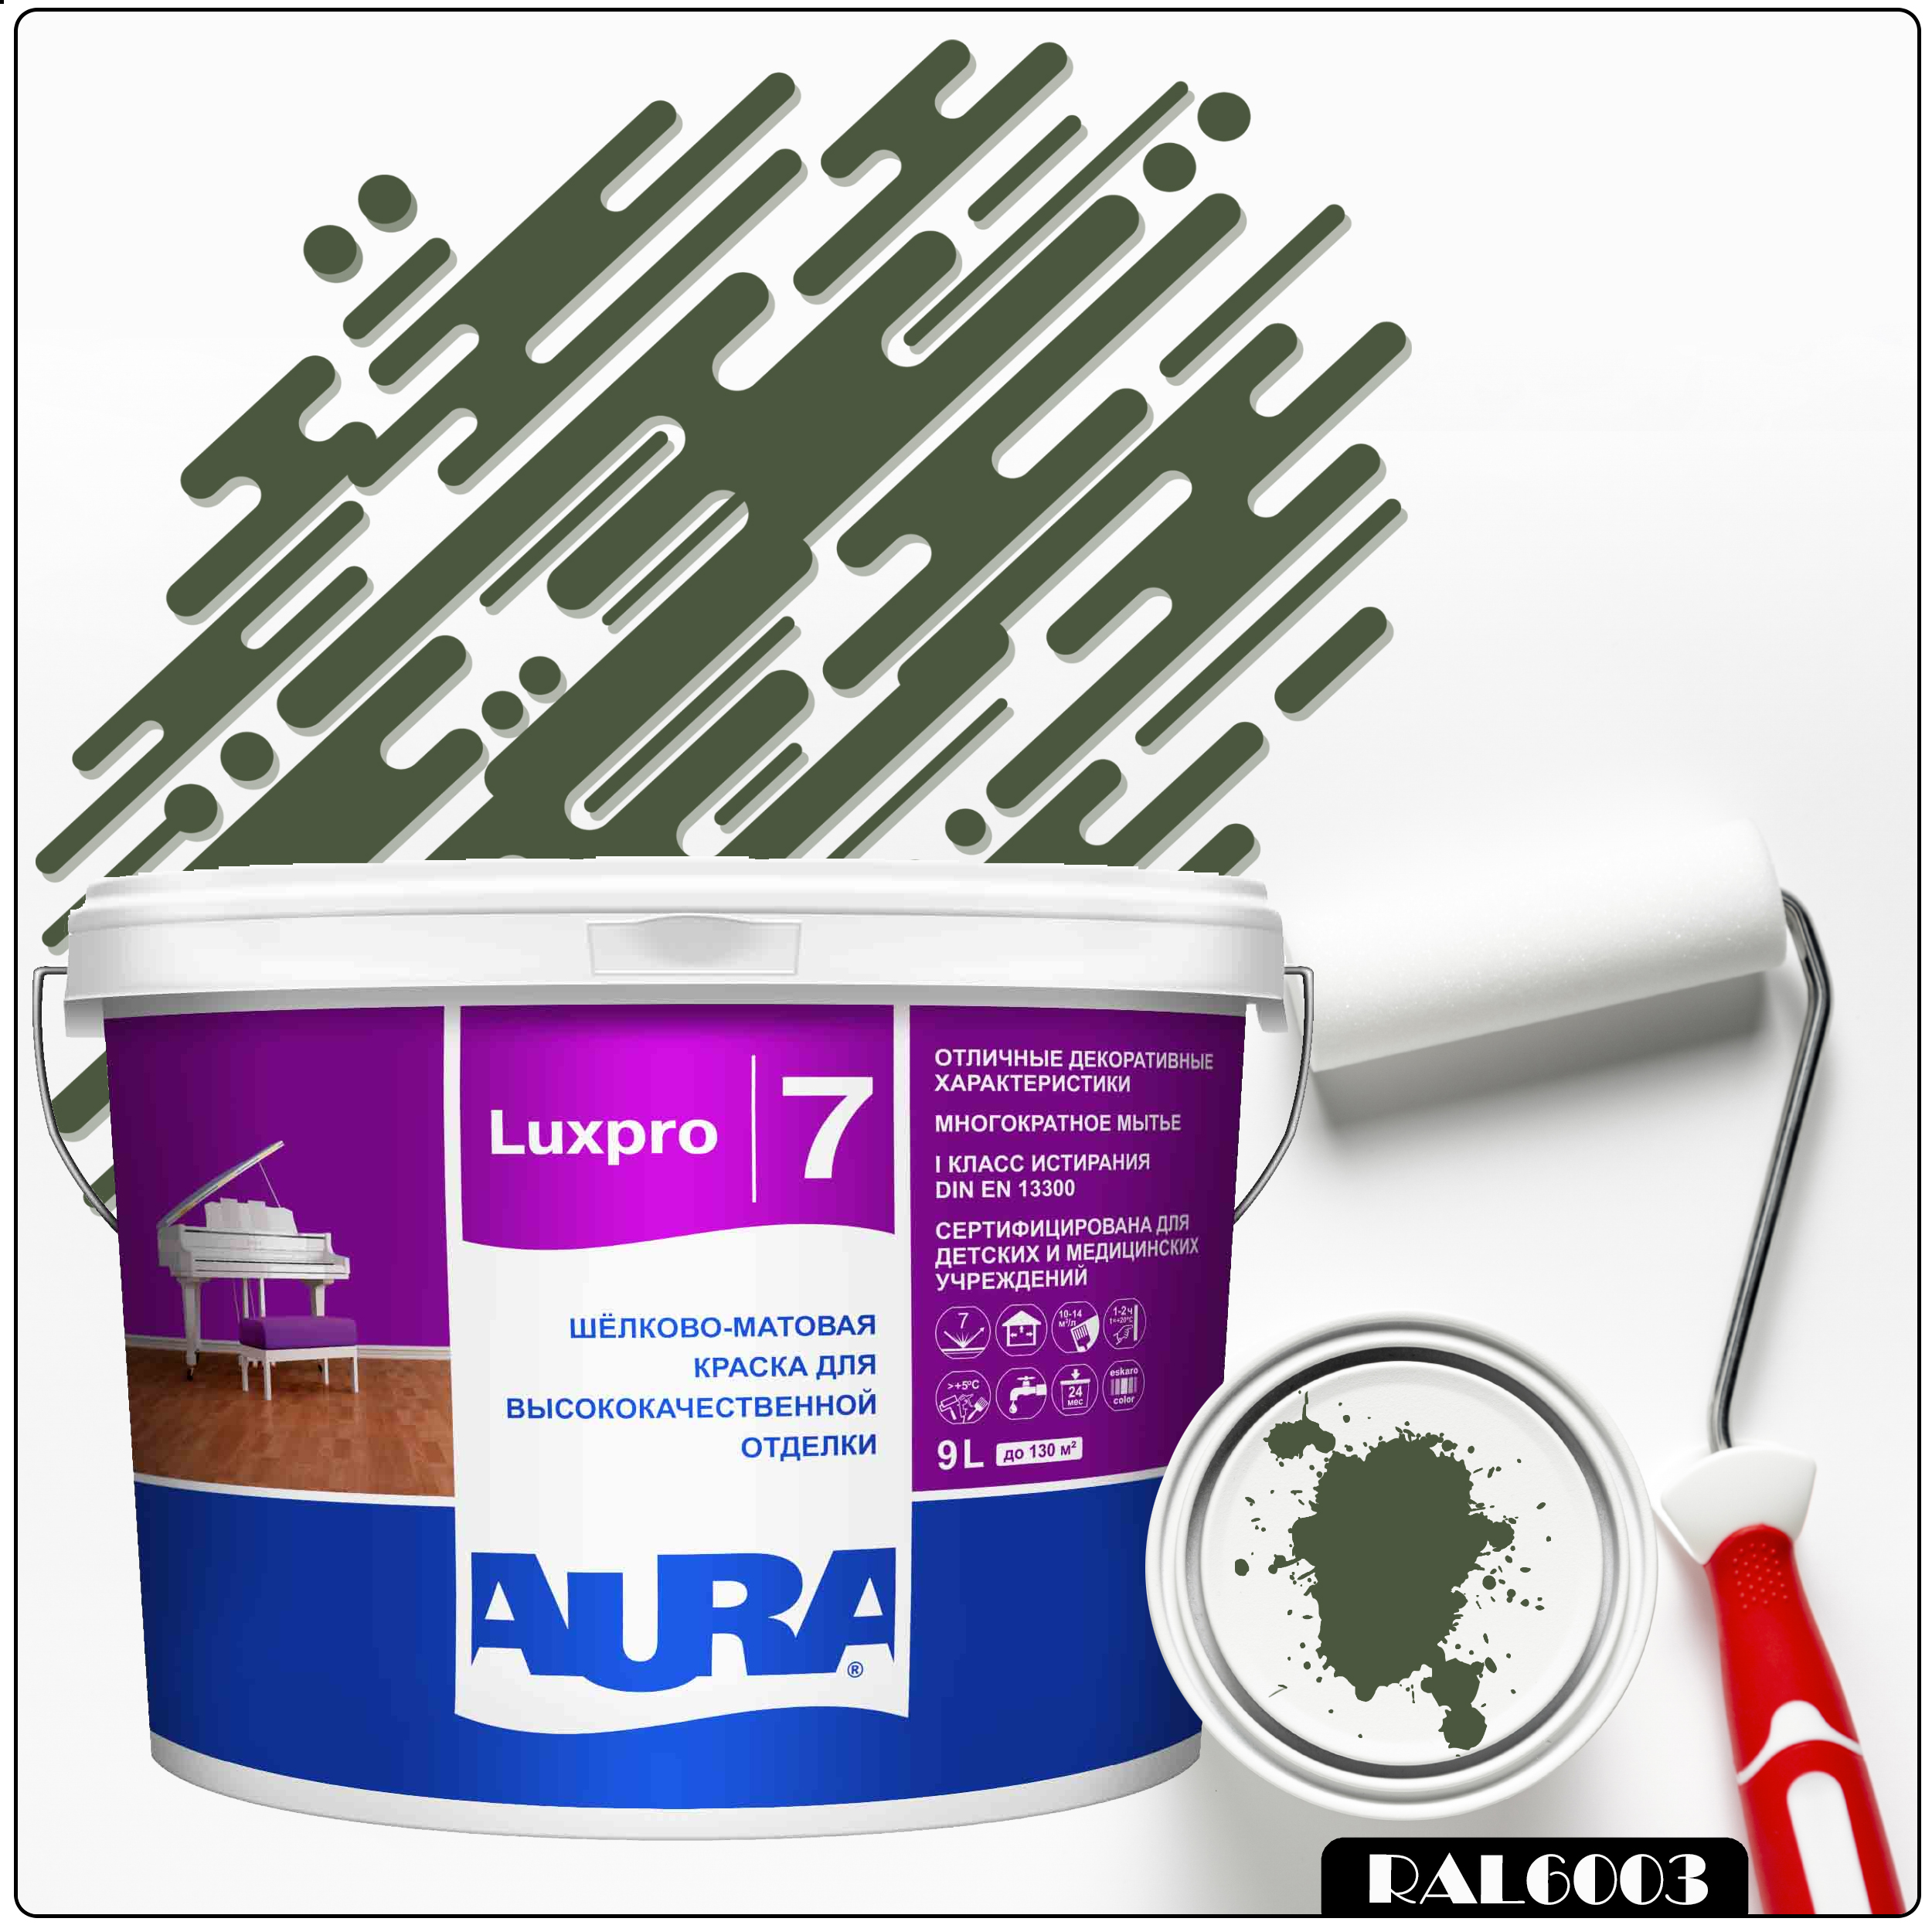 Фото 4 - Краска Aura LuxPRO 7, RAL 6003 Оливково-зеленый, латексная, шелково-матовая, интерьерная, 9л, Аура.